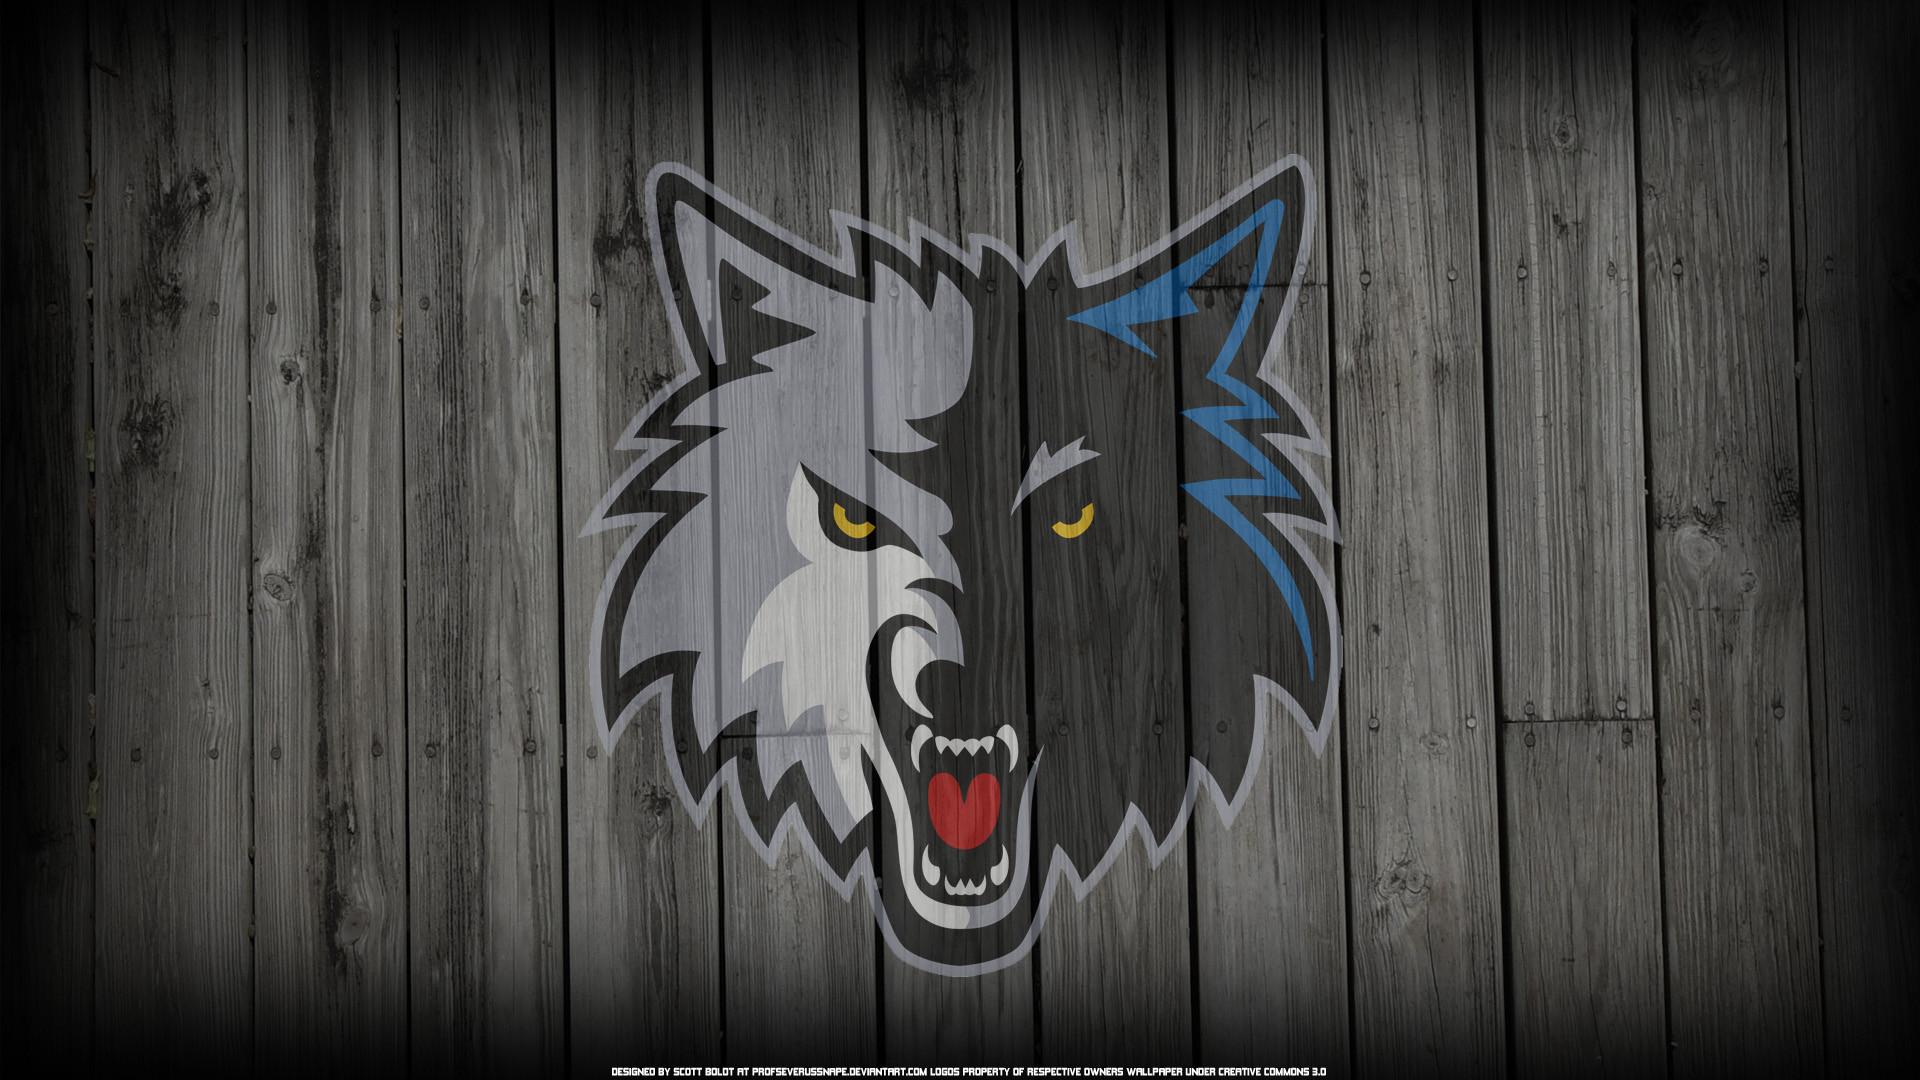 Minnesota Timberwolves Iphone Wallpaper 69 Images